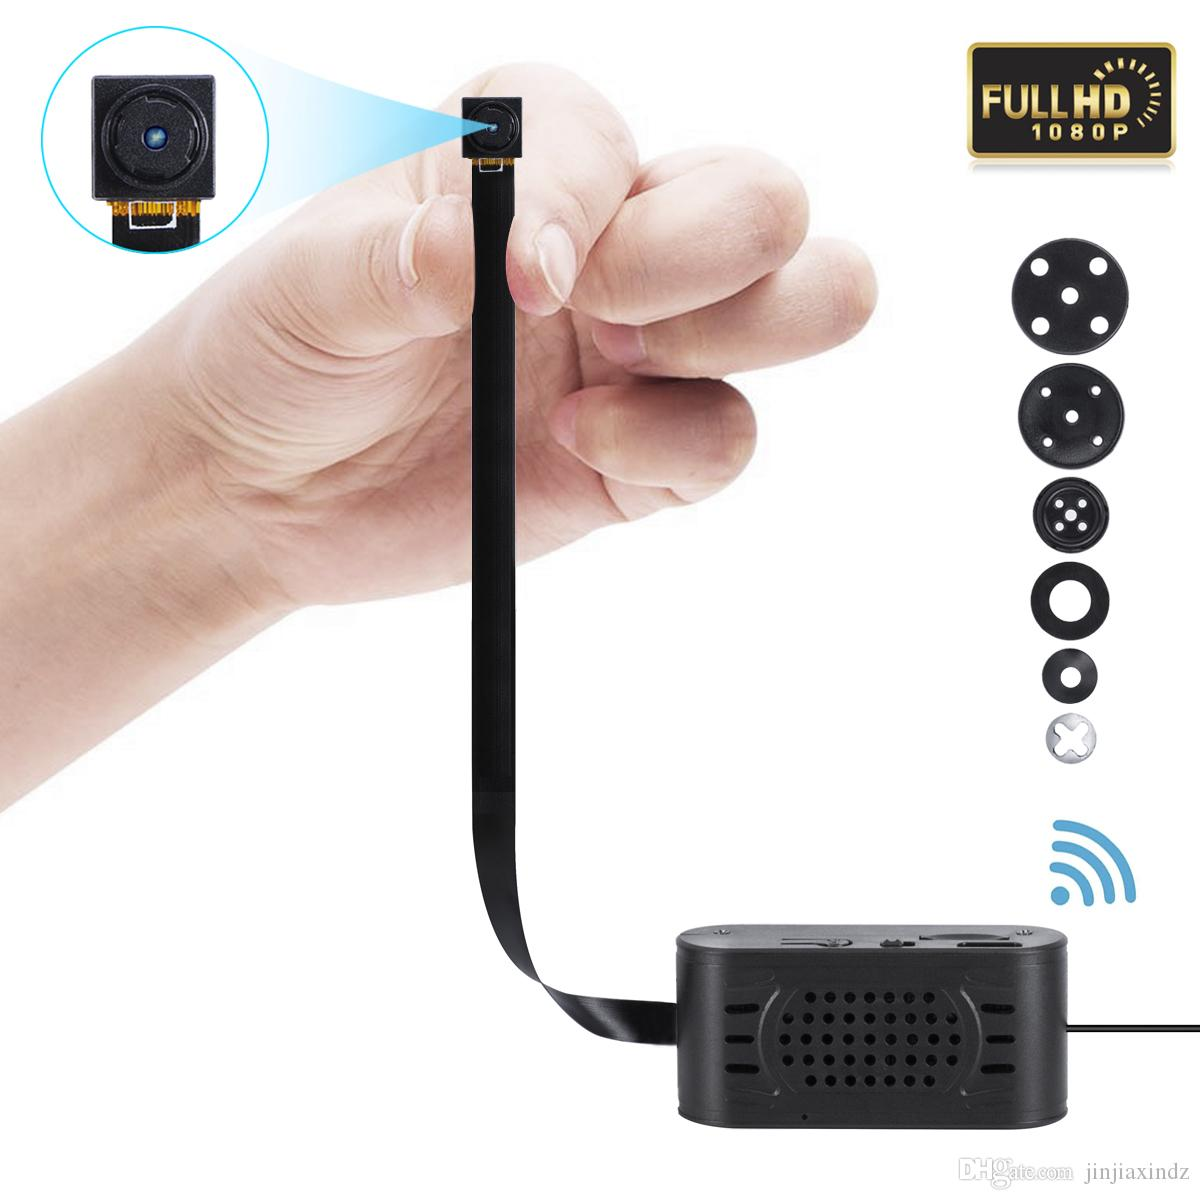 V89 1080P module board pinhole Camera HD wireless wifi P2P DIY Module IP Camera with power bank H.264 DVR Wireless Surveillance Cameras